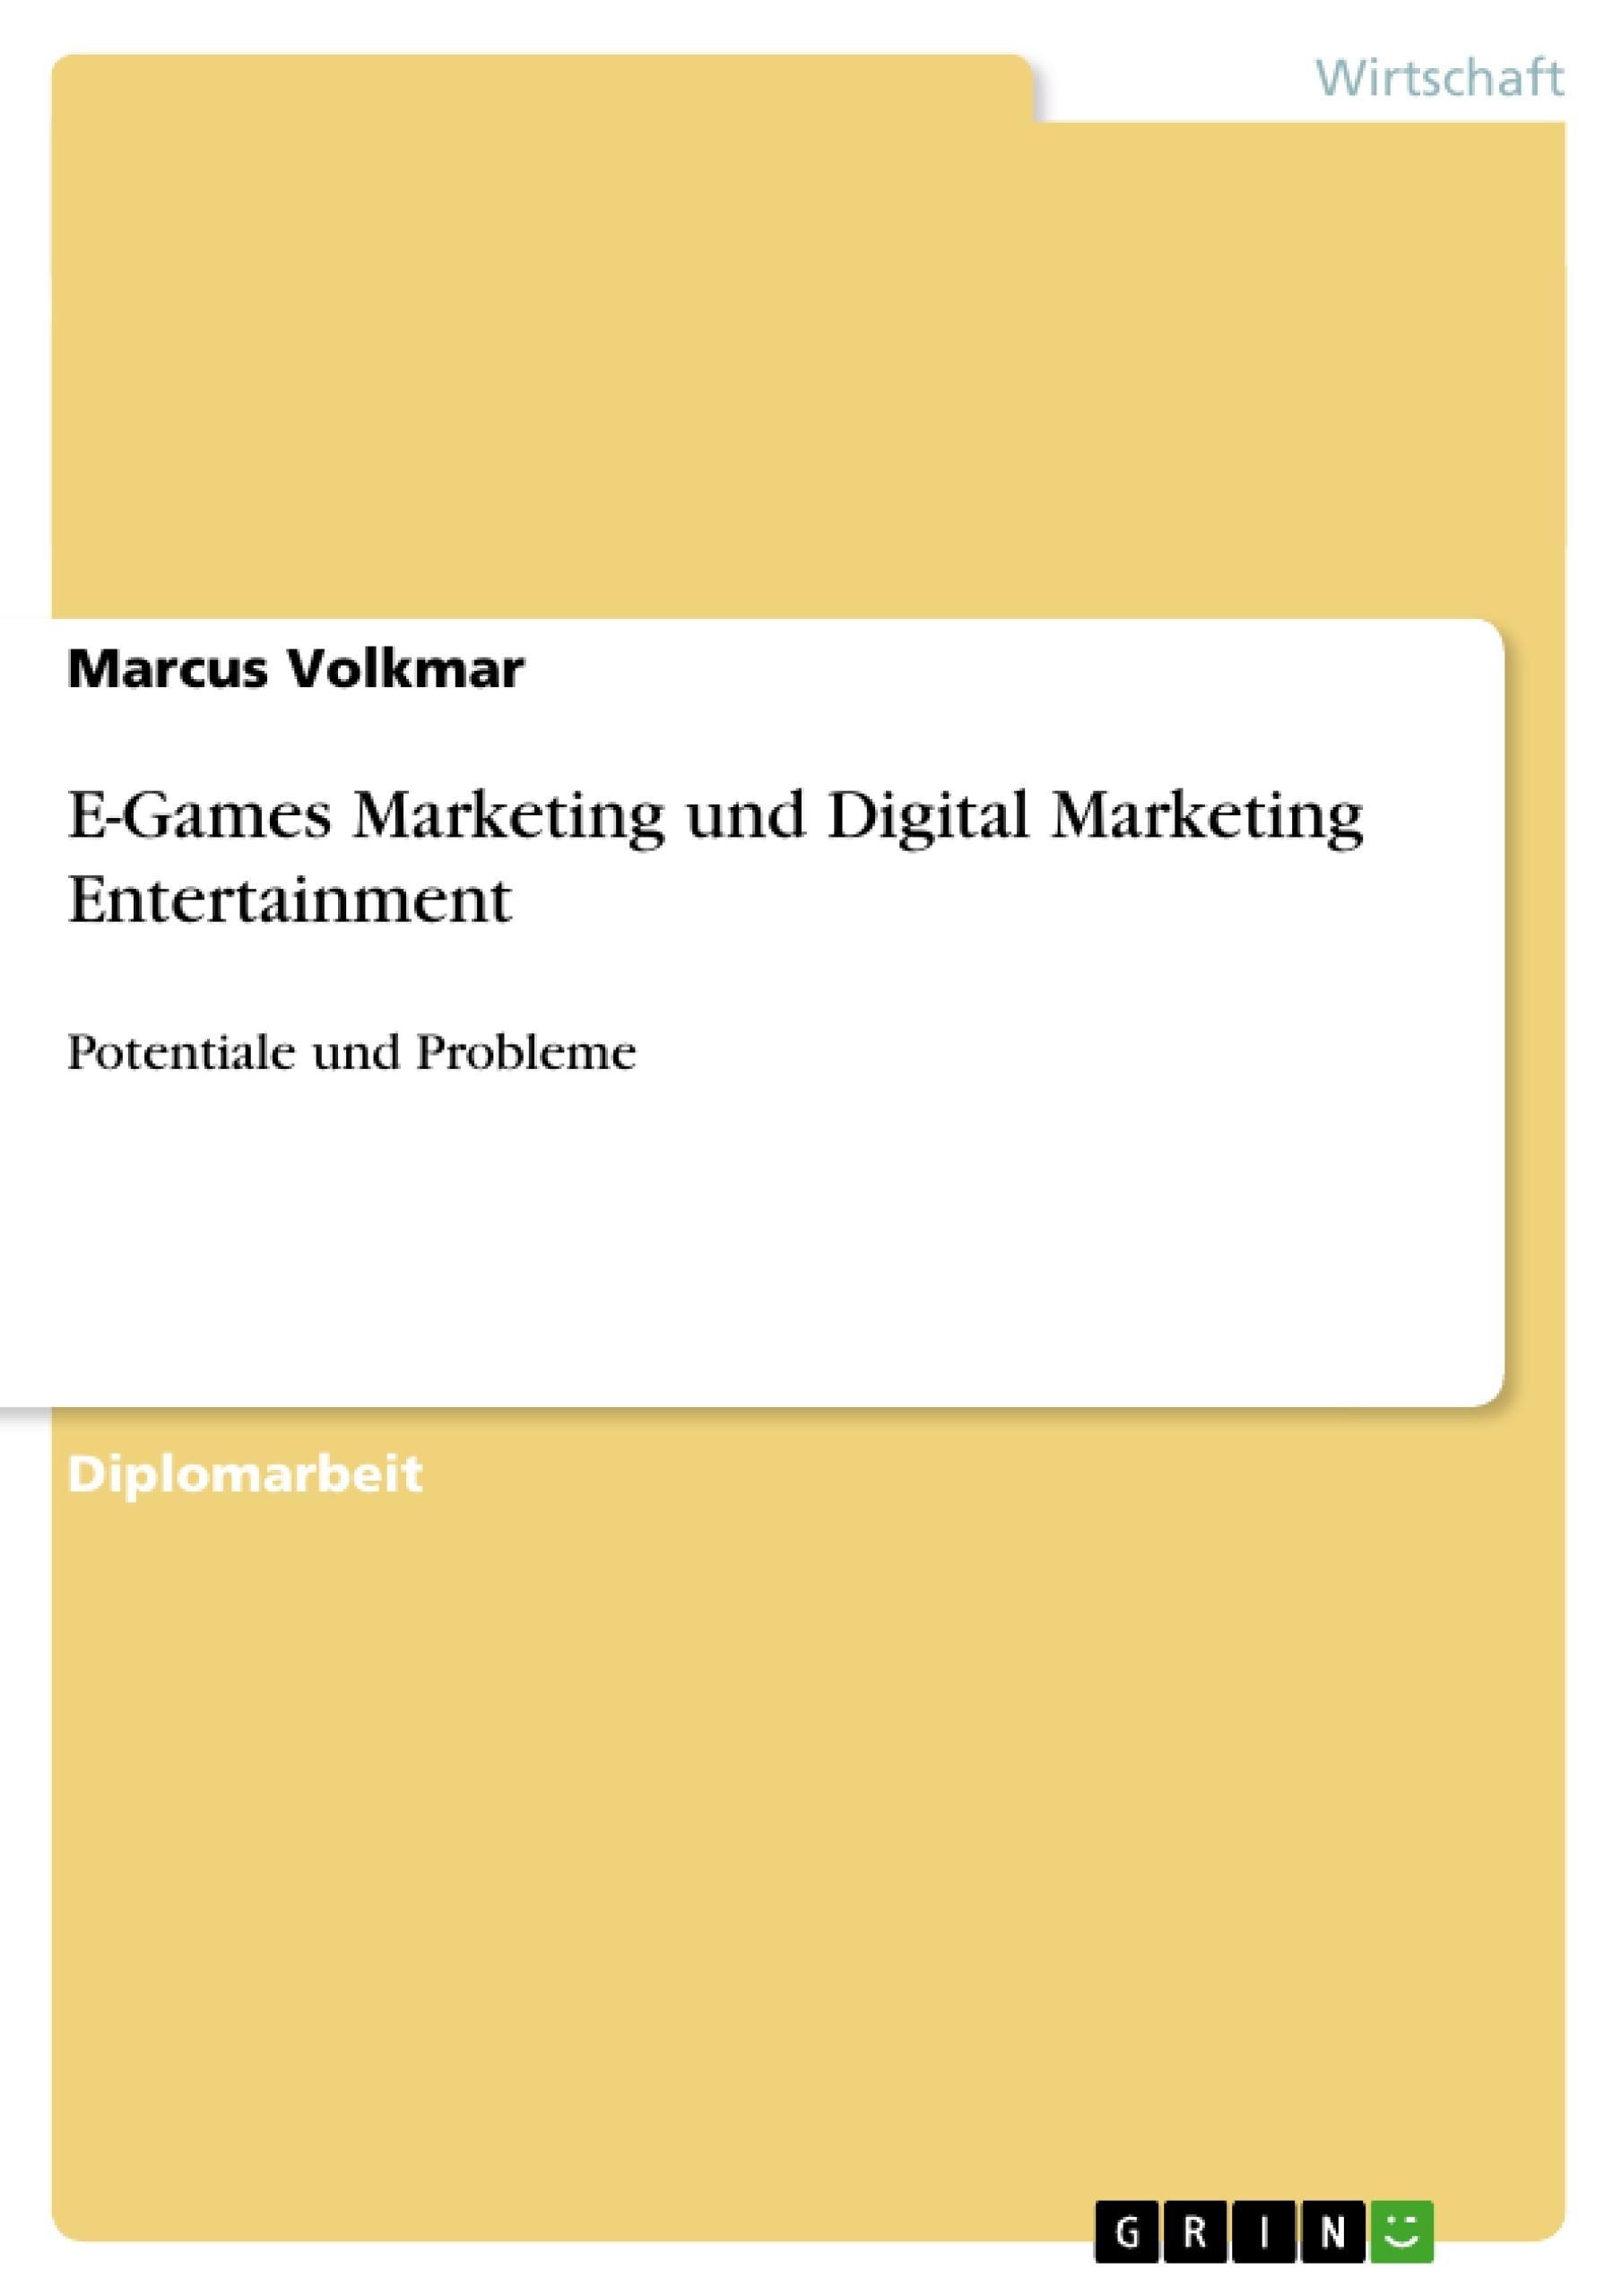 Titel: E-Games Marketing und Digital Marketing Entertainment